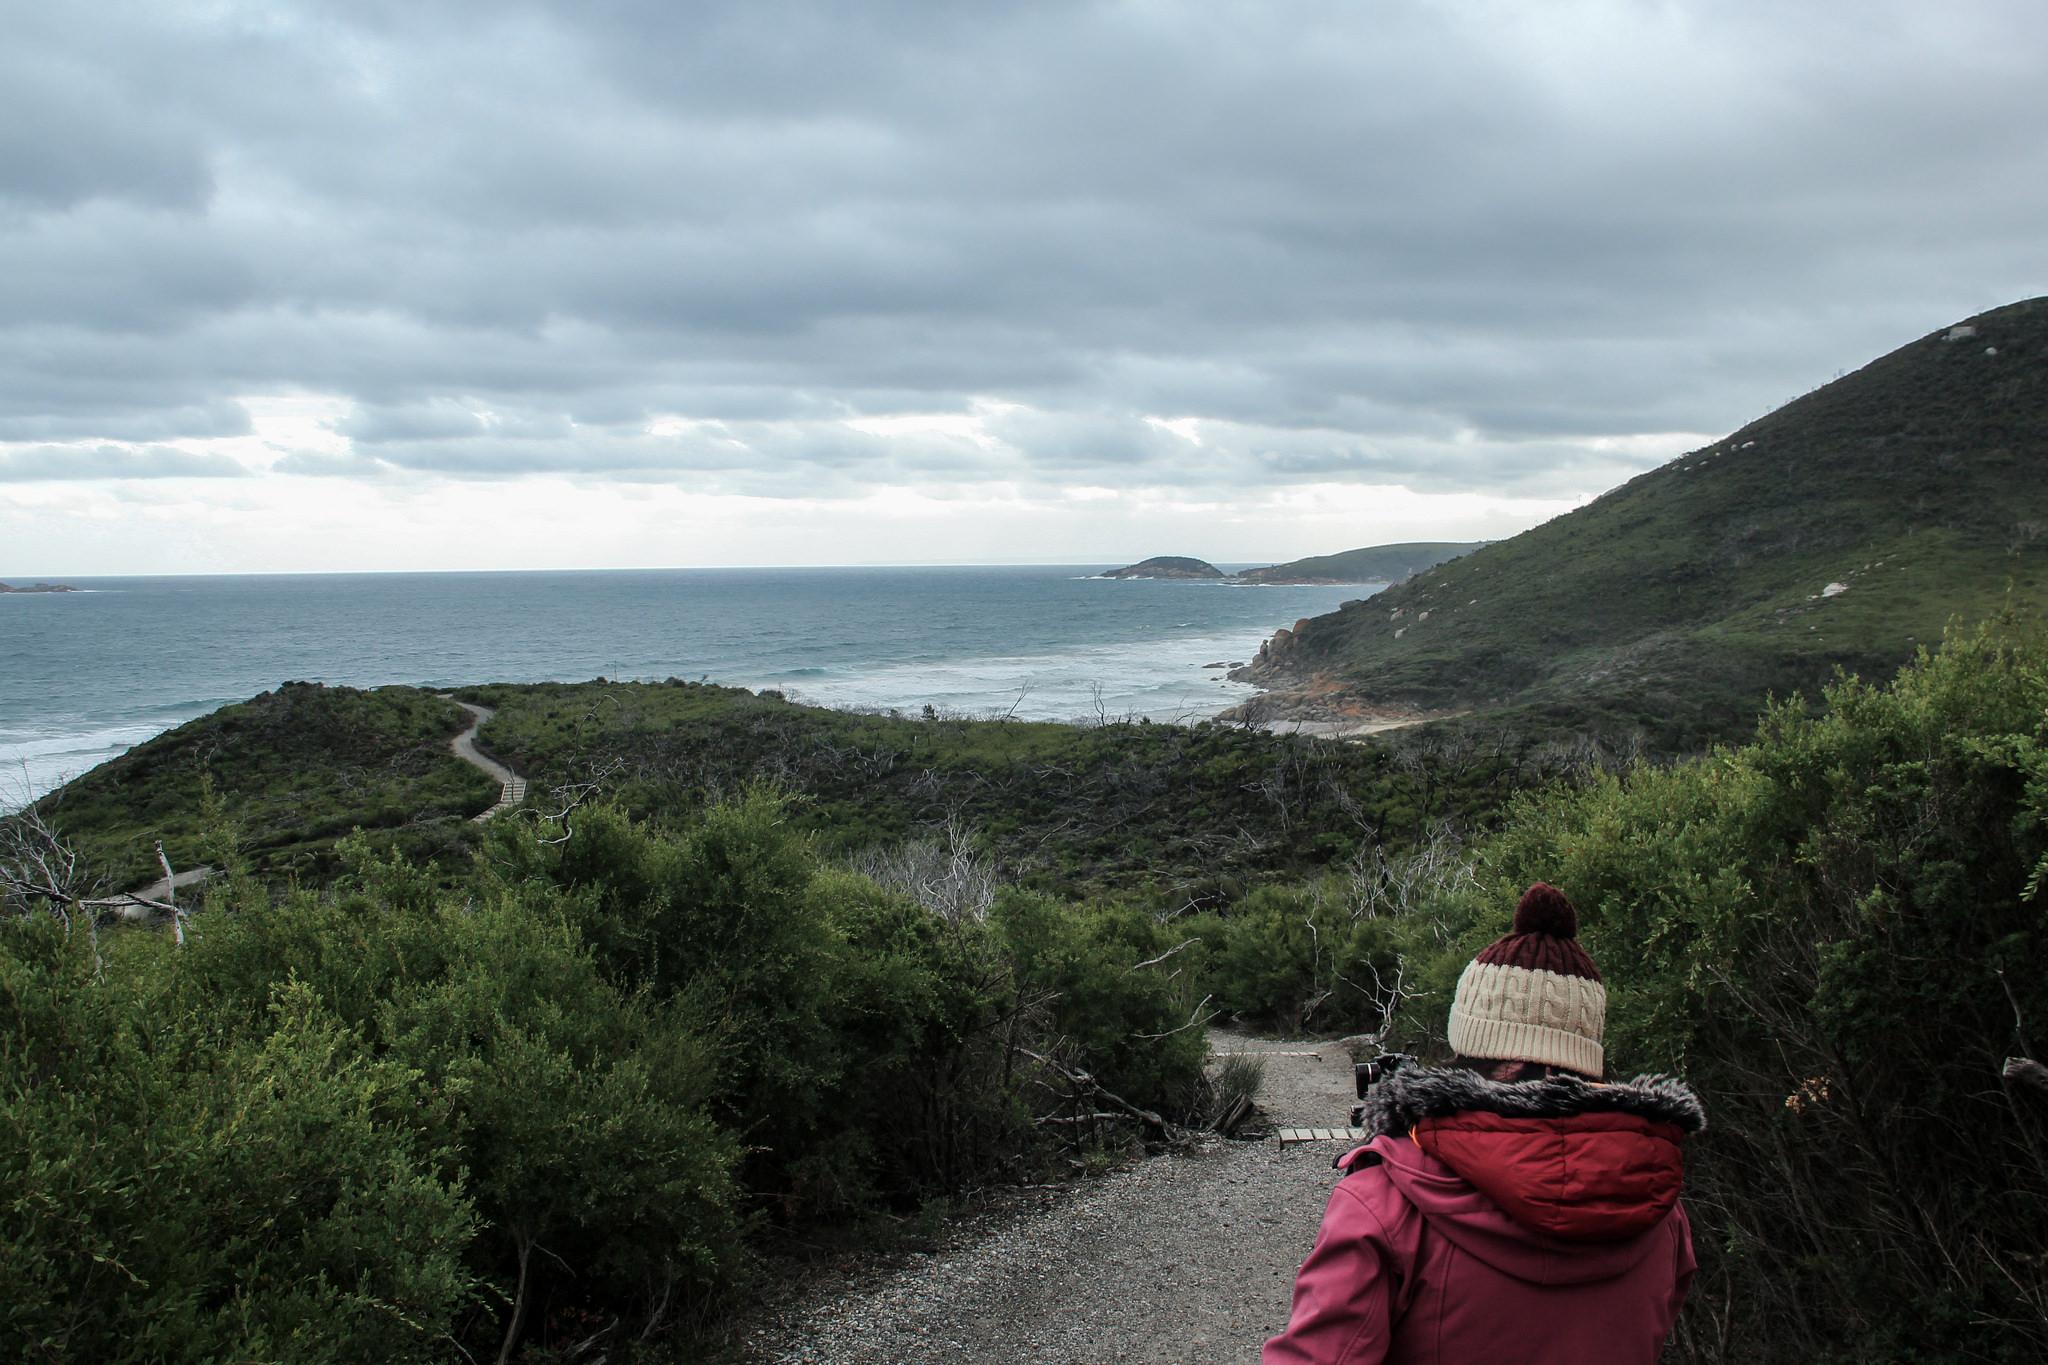 menina na trilha perto das montanhas